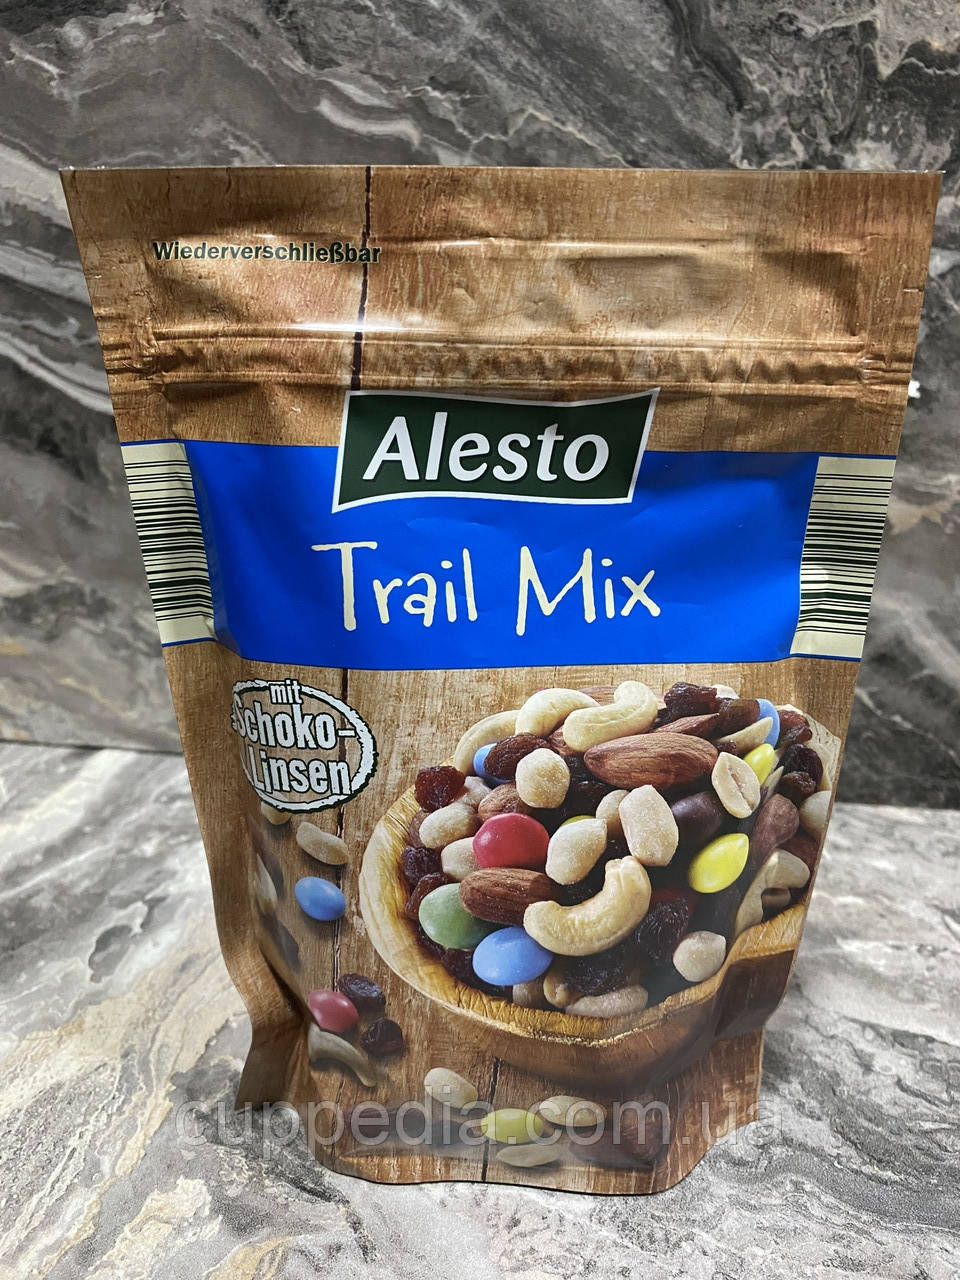 Смесь орехов, изюма и шоколадного драже Alesto Trail Mix 250 грм